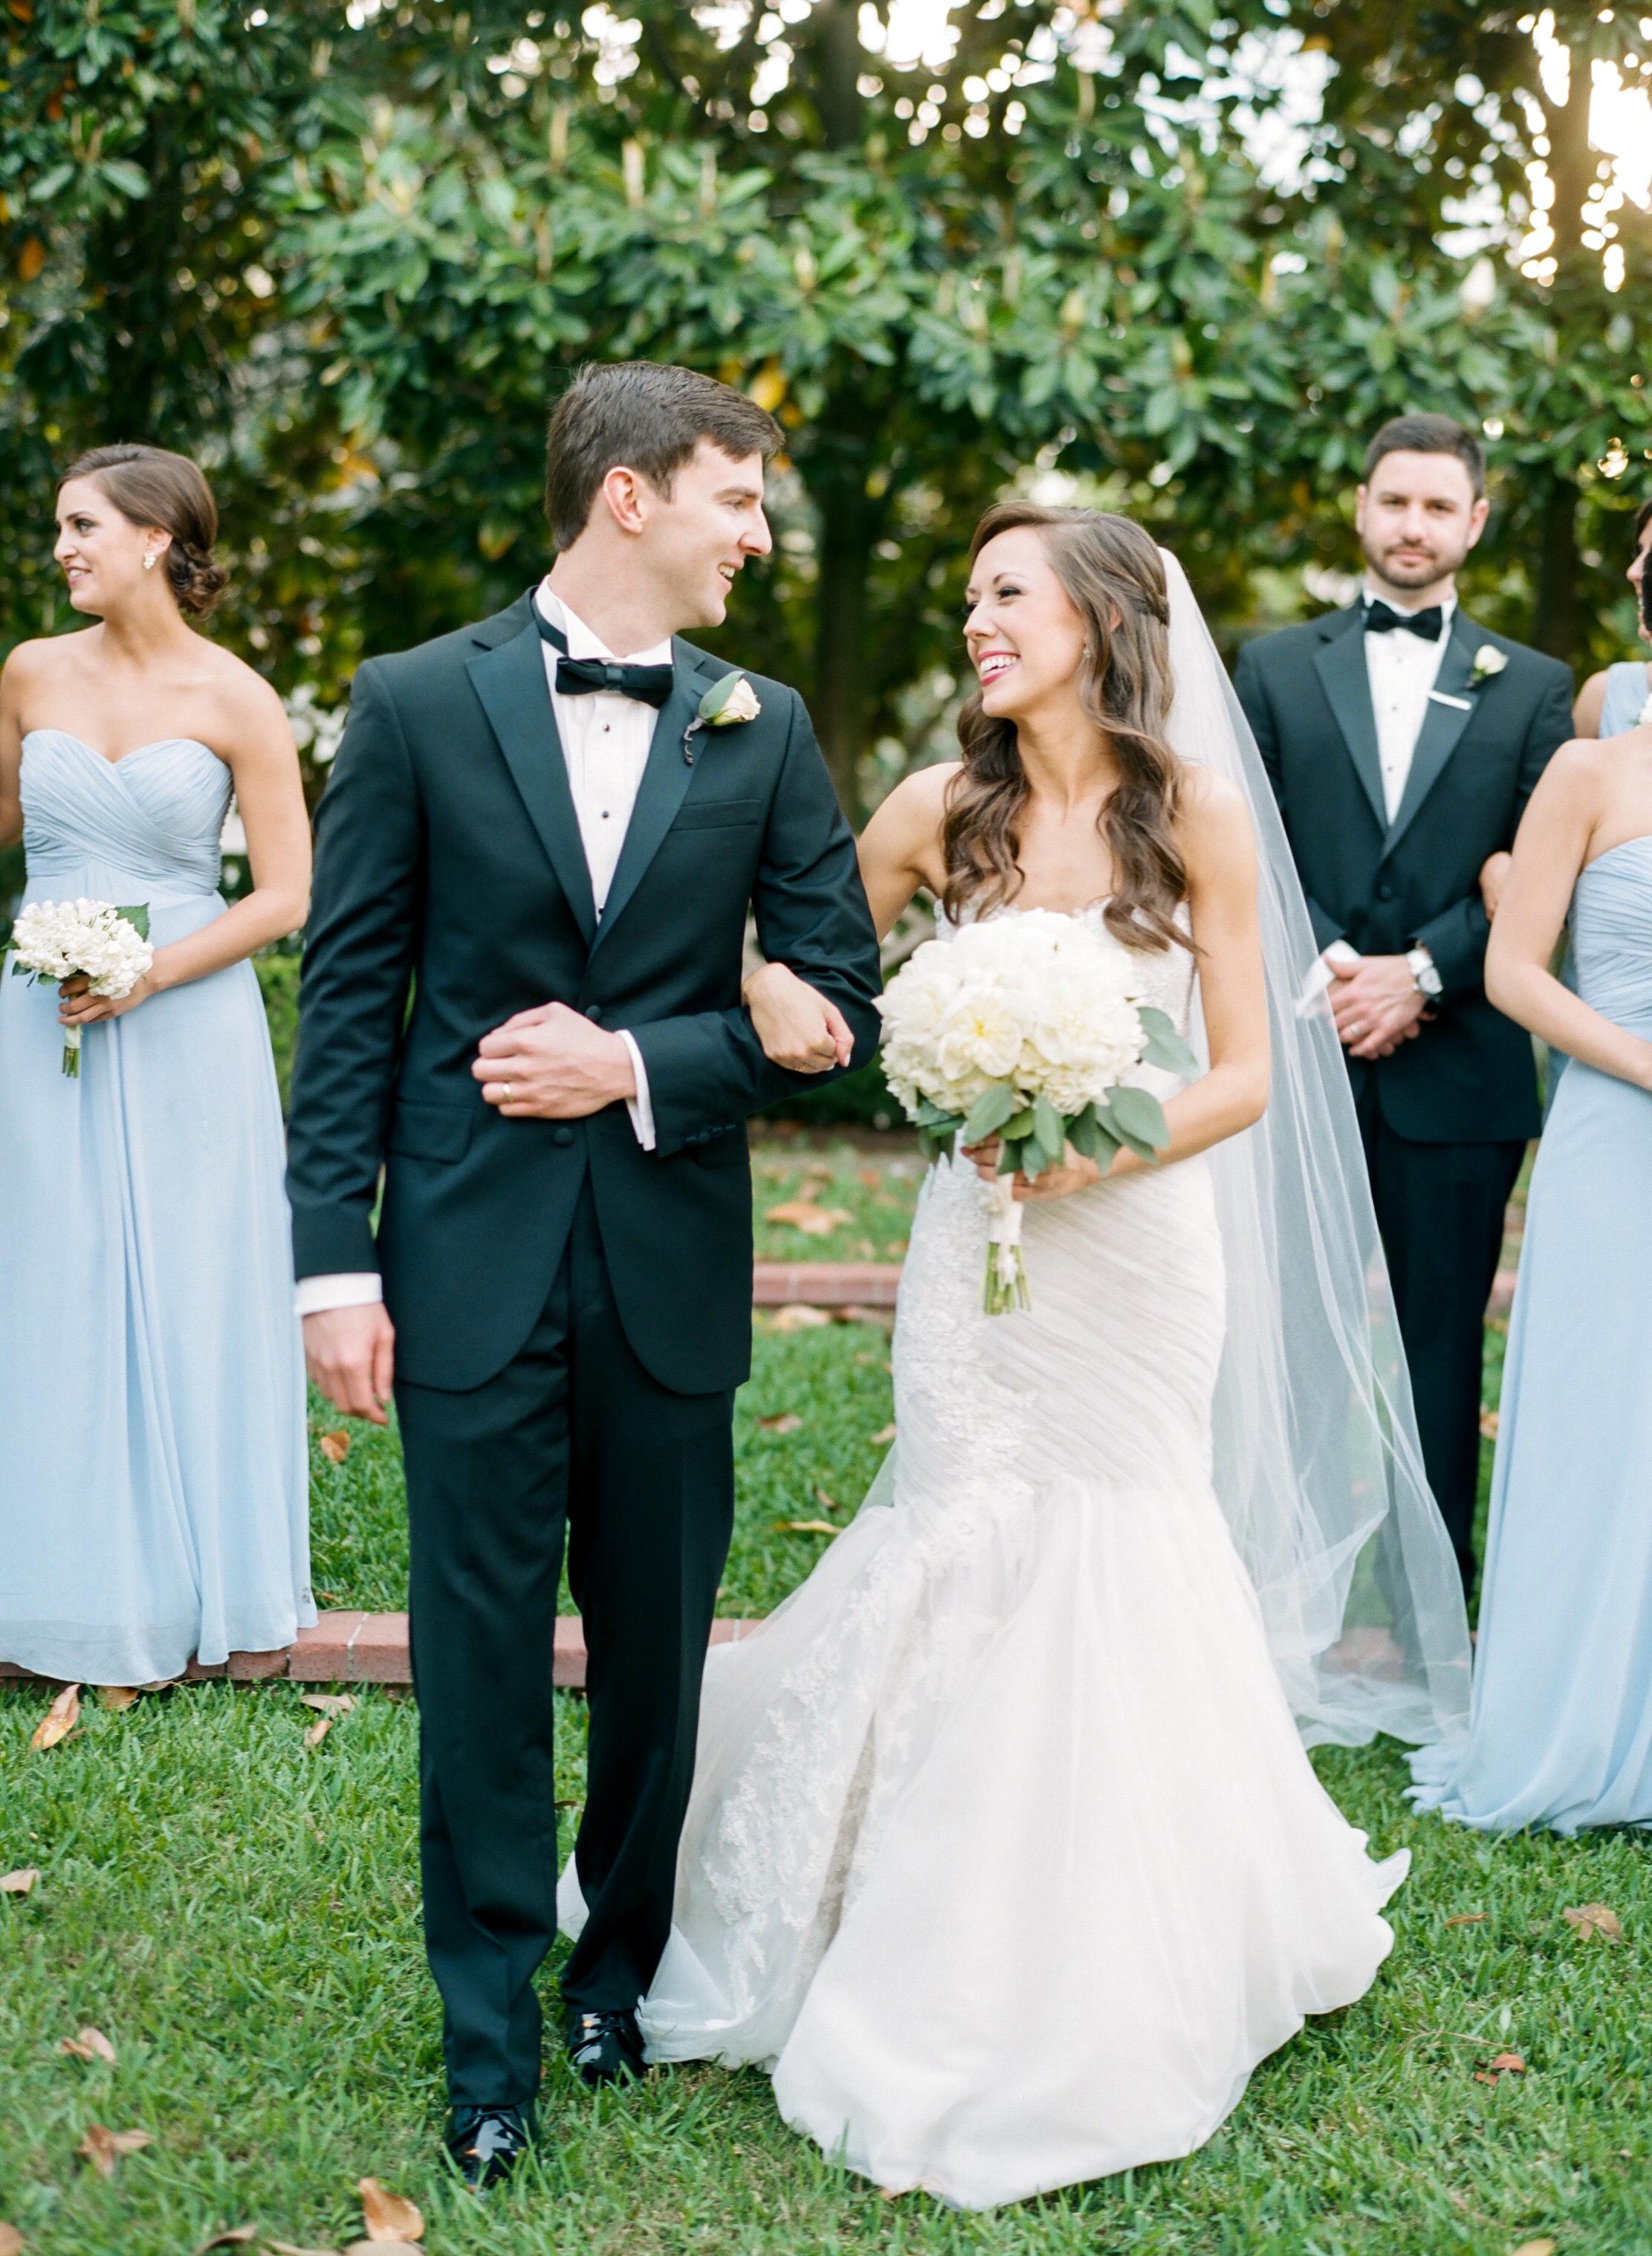 St.-Philip-Presbyterian-Church-Houston-Wedding-Ceremony-The-Junior-League-Of-Houston-Reception-Dana-Fernandez-Photography-Fine-Art-Film-17.jpg